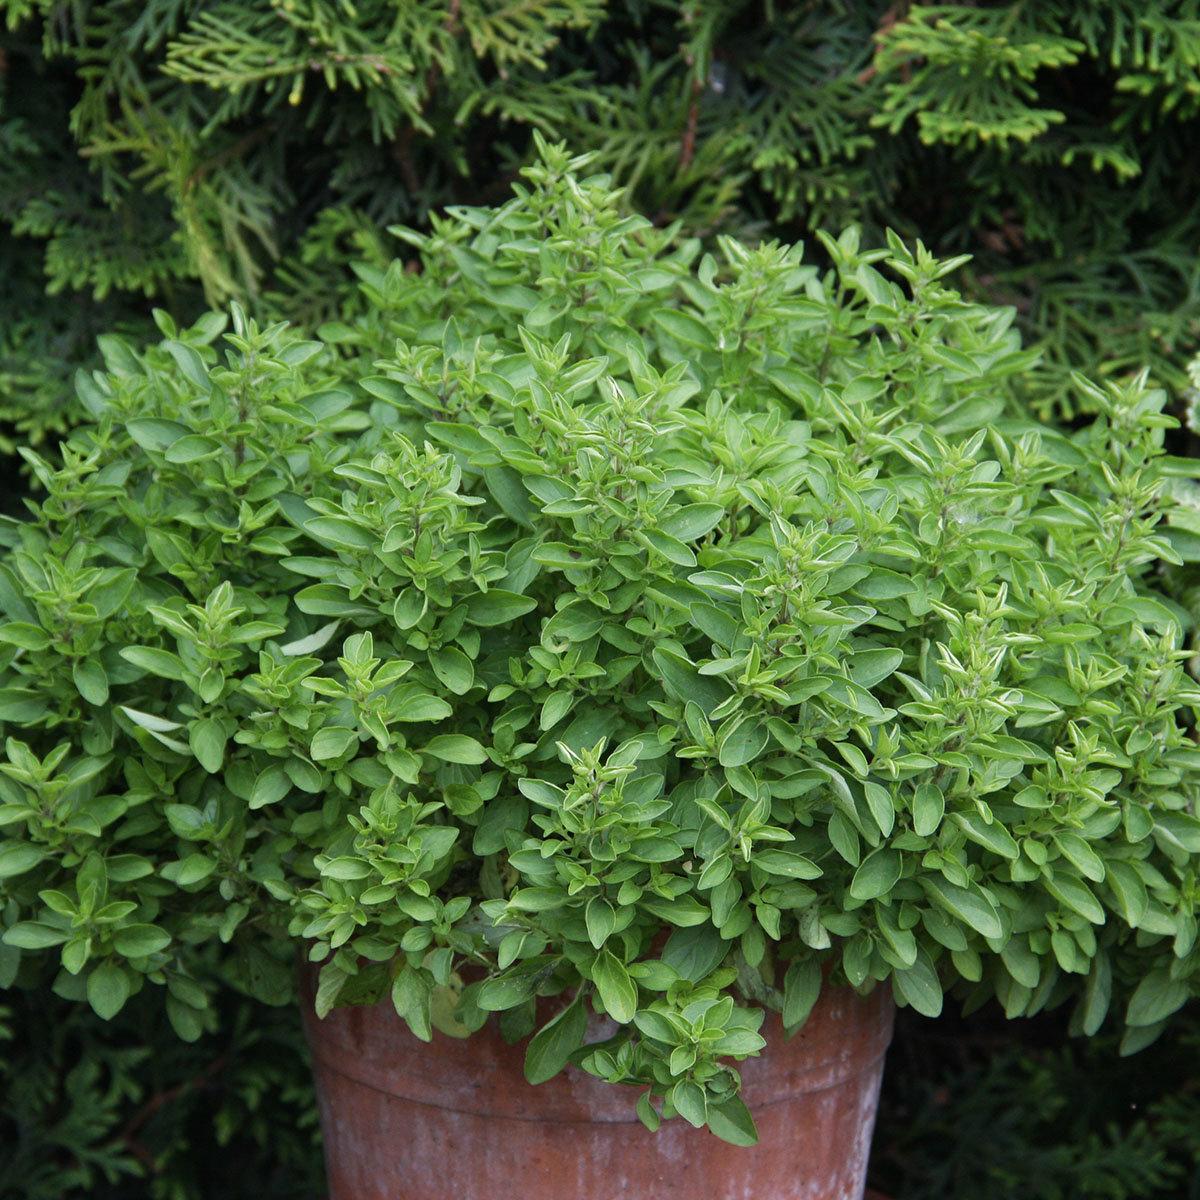 Küchenkräuterpflanze Oregano Kreta, im ca. 12 cm-Topf | #3